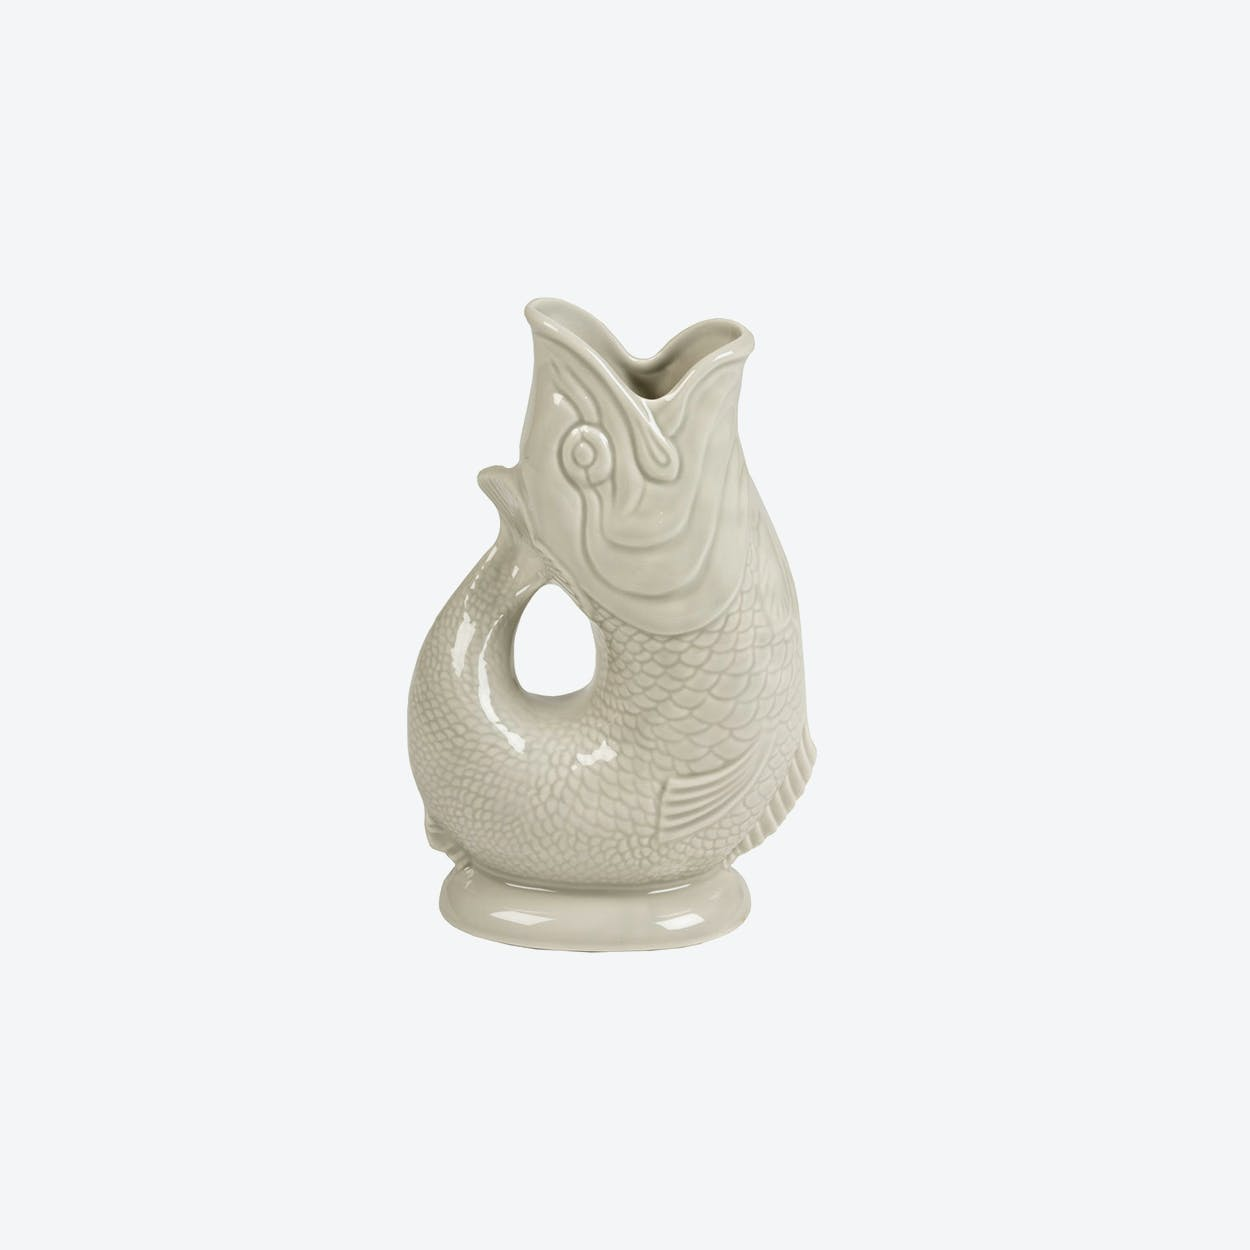 Ceramic Fish Shaped Water Jug XL in Light Grey